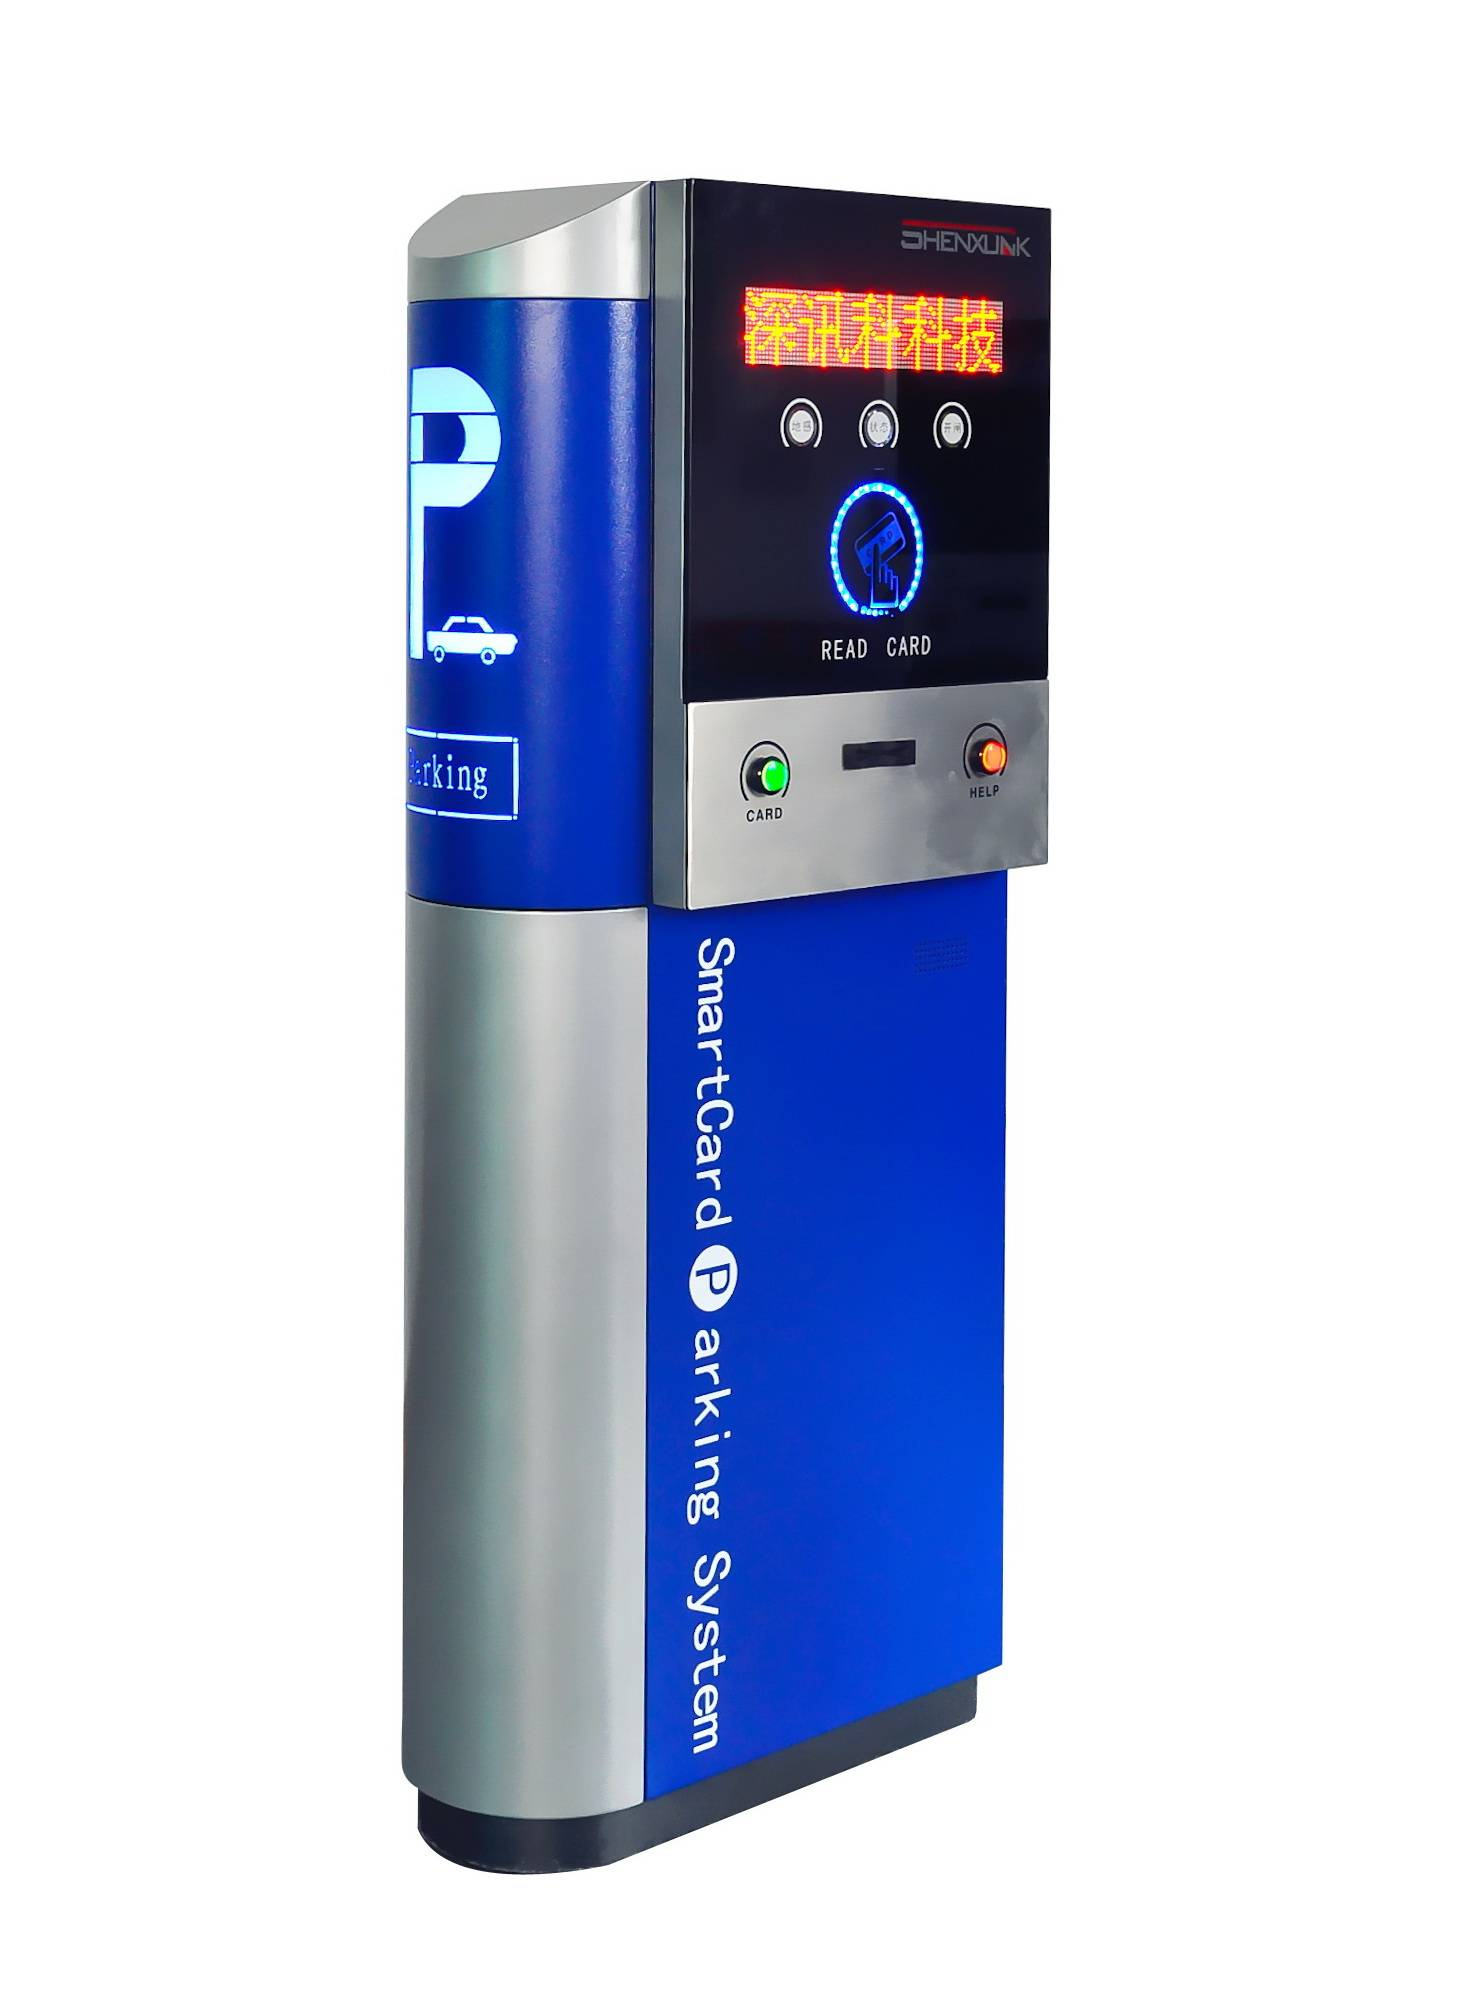 Car Park Management System with Barcode Ticket Dispenser and smart card reader